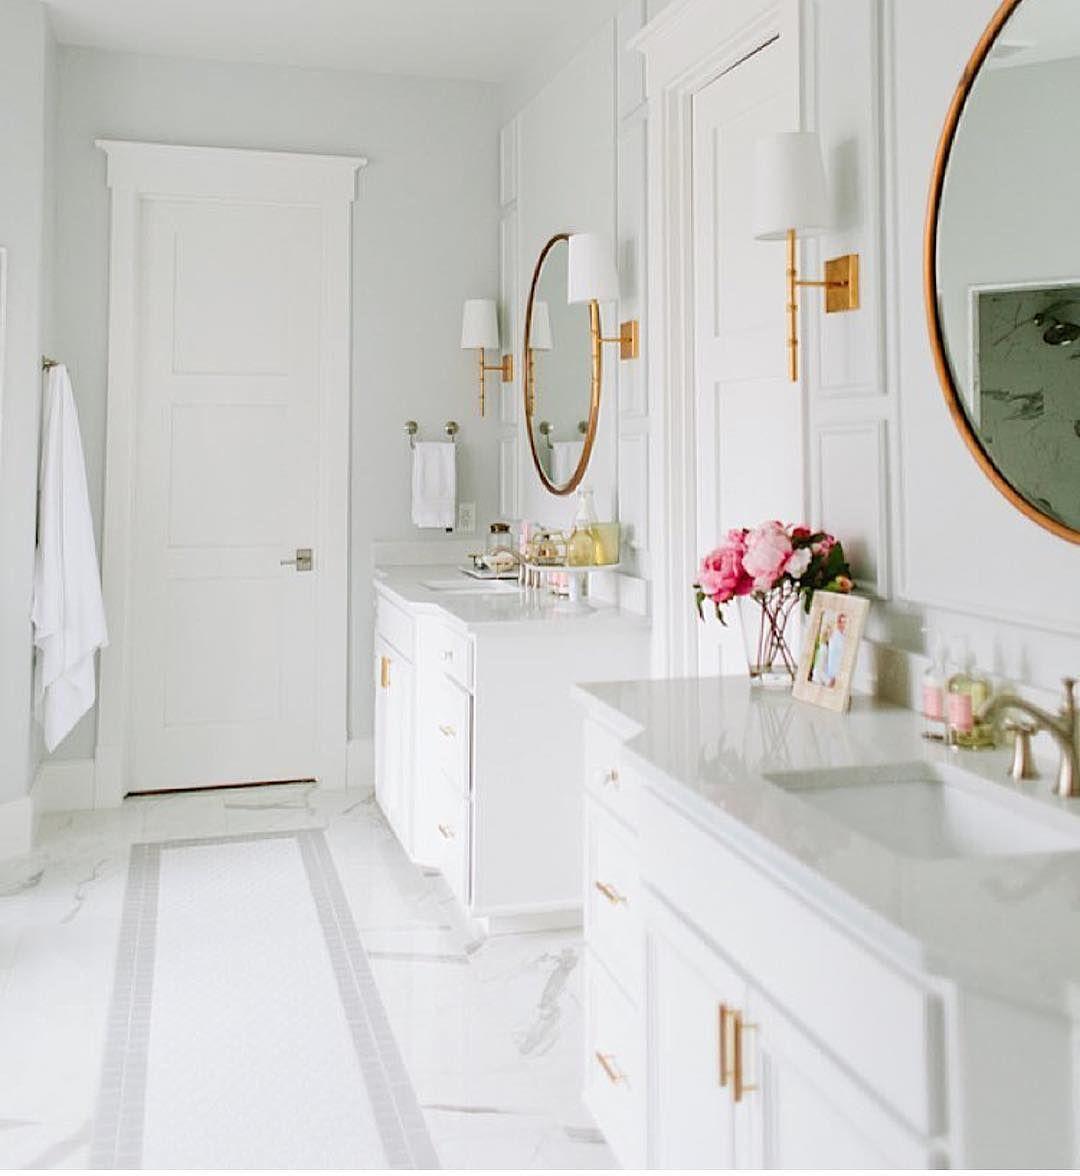 Pin by Rebecca Brannen on Bathroom | Pinterest | Bath, Master ...